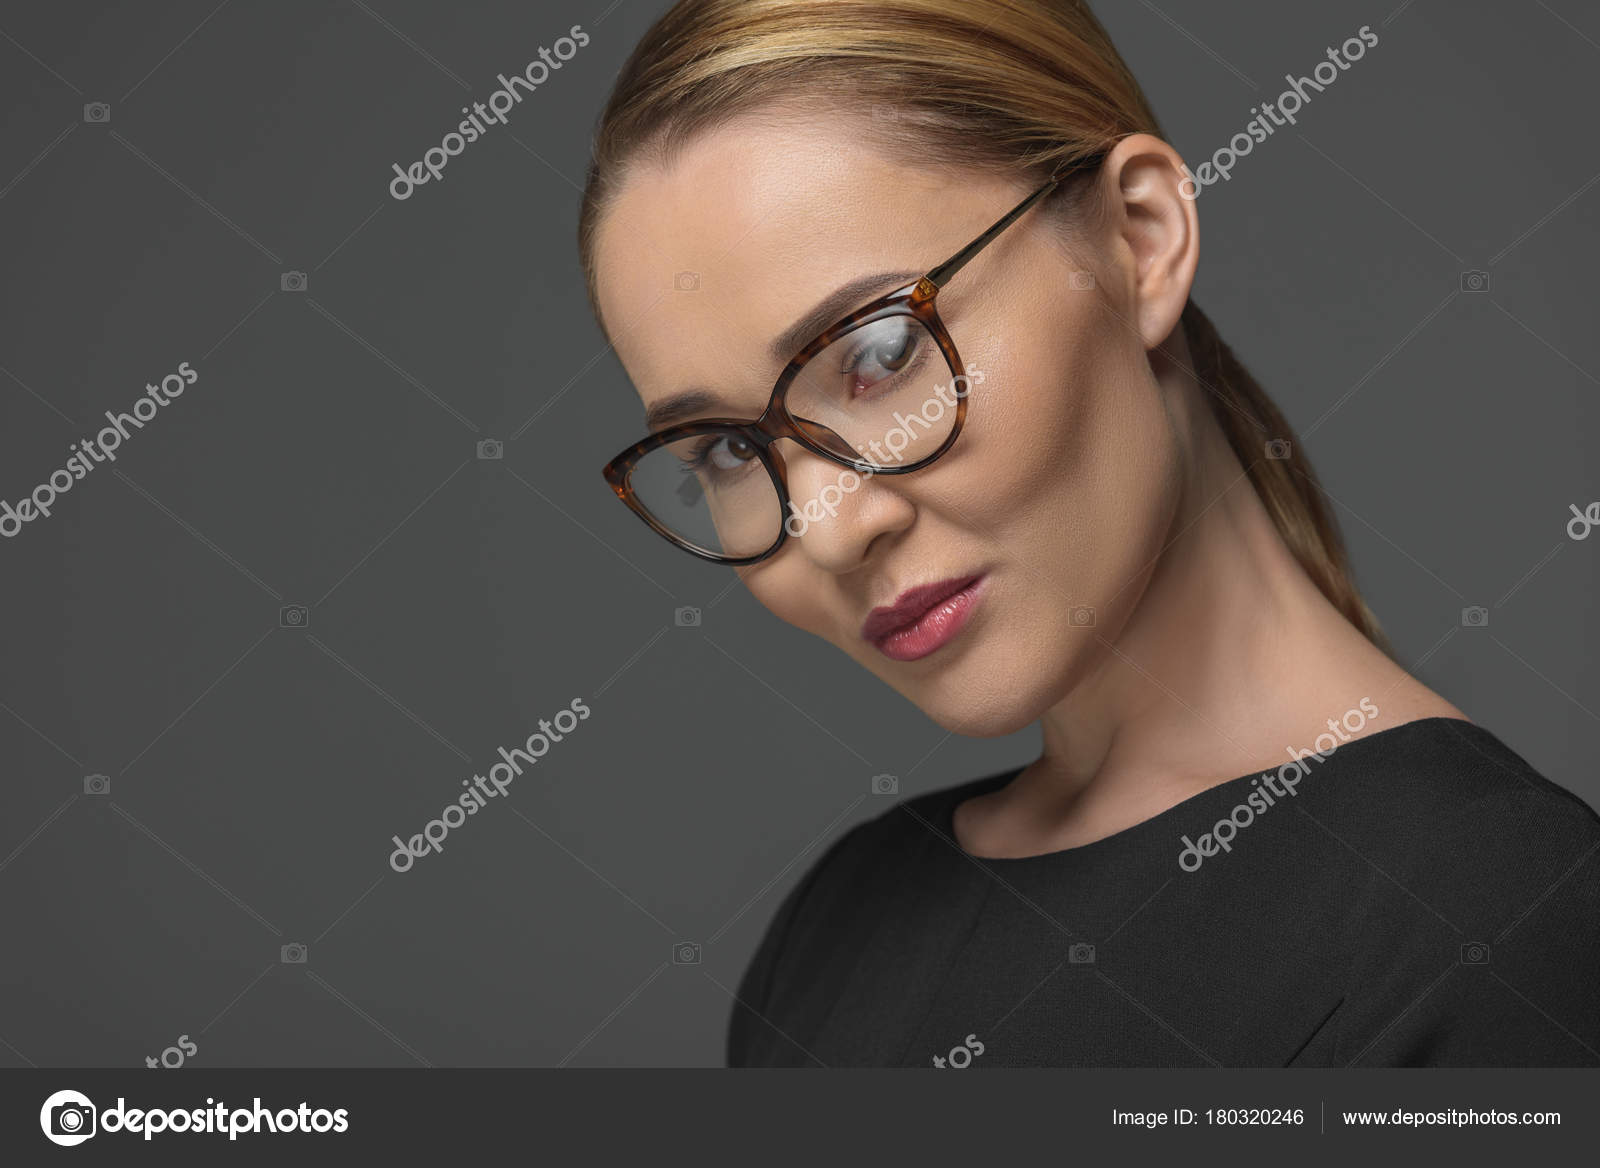 53923de99f68a8 Close Portret Van Mooie Vrouw Van Kazachs Bril Kijken Camera — Stockfoto